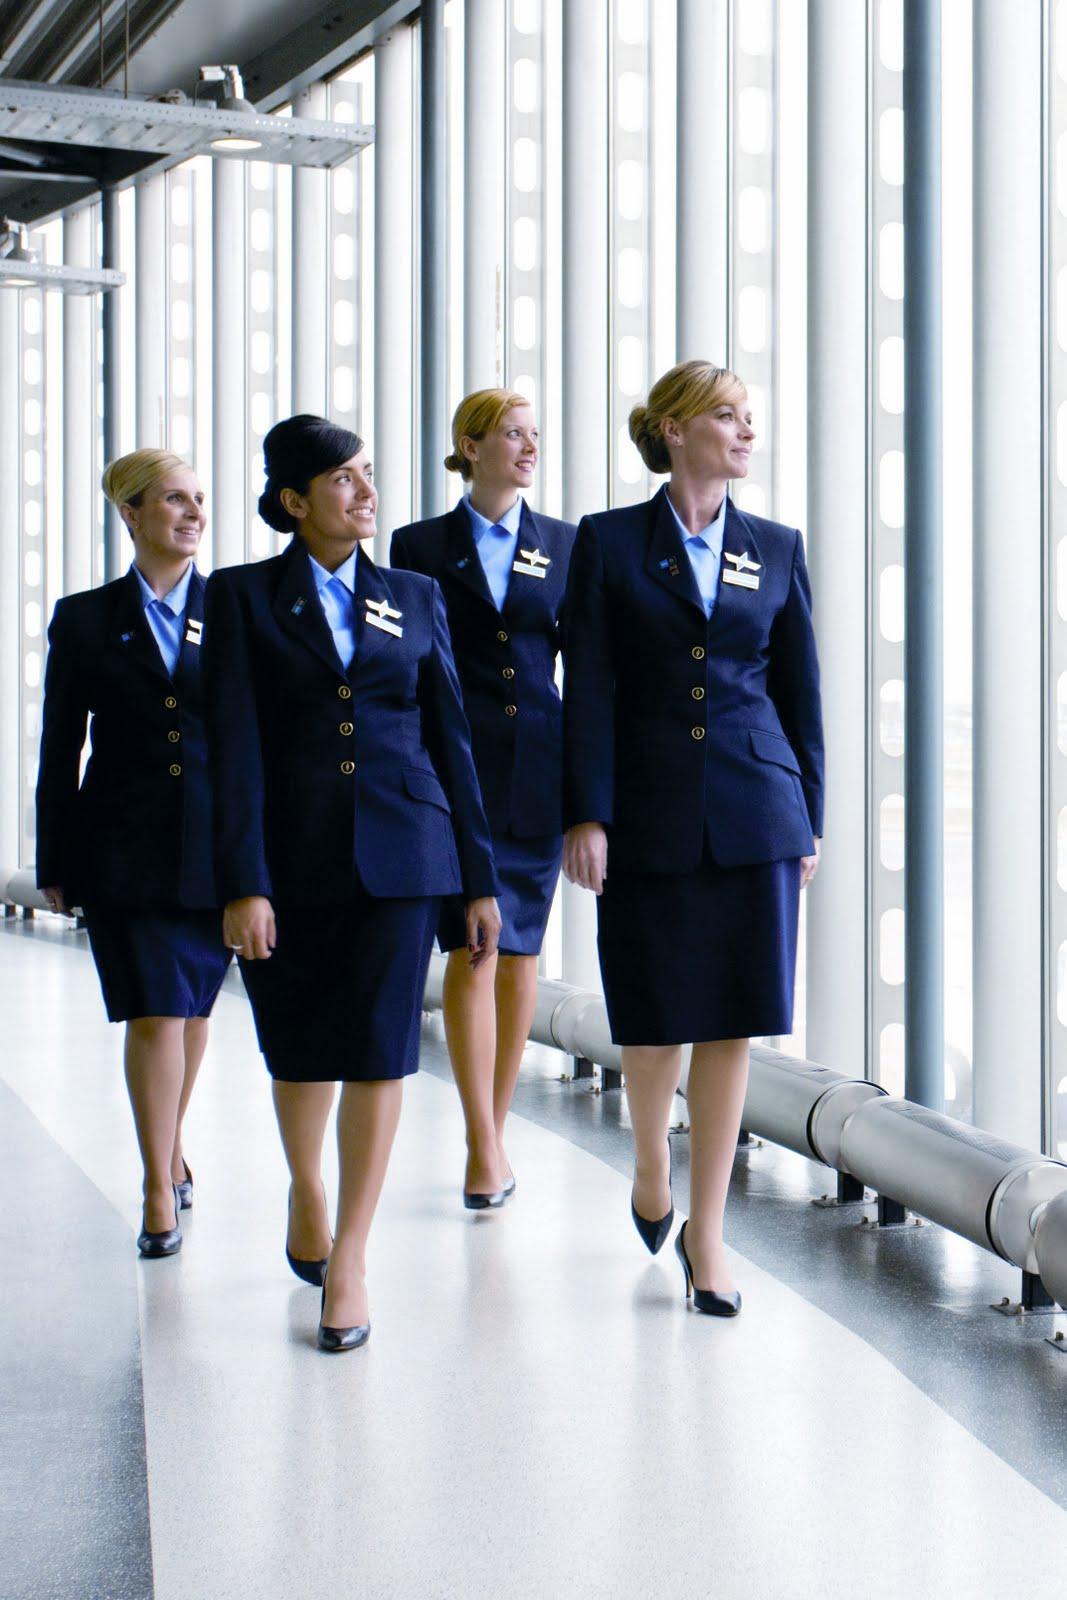 Best Cabinet Crewsexcy Airhostessairbabes With Dumps